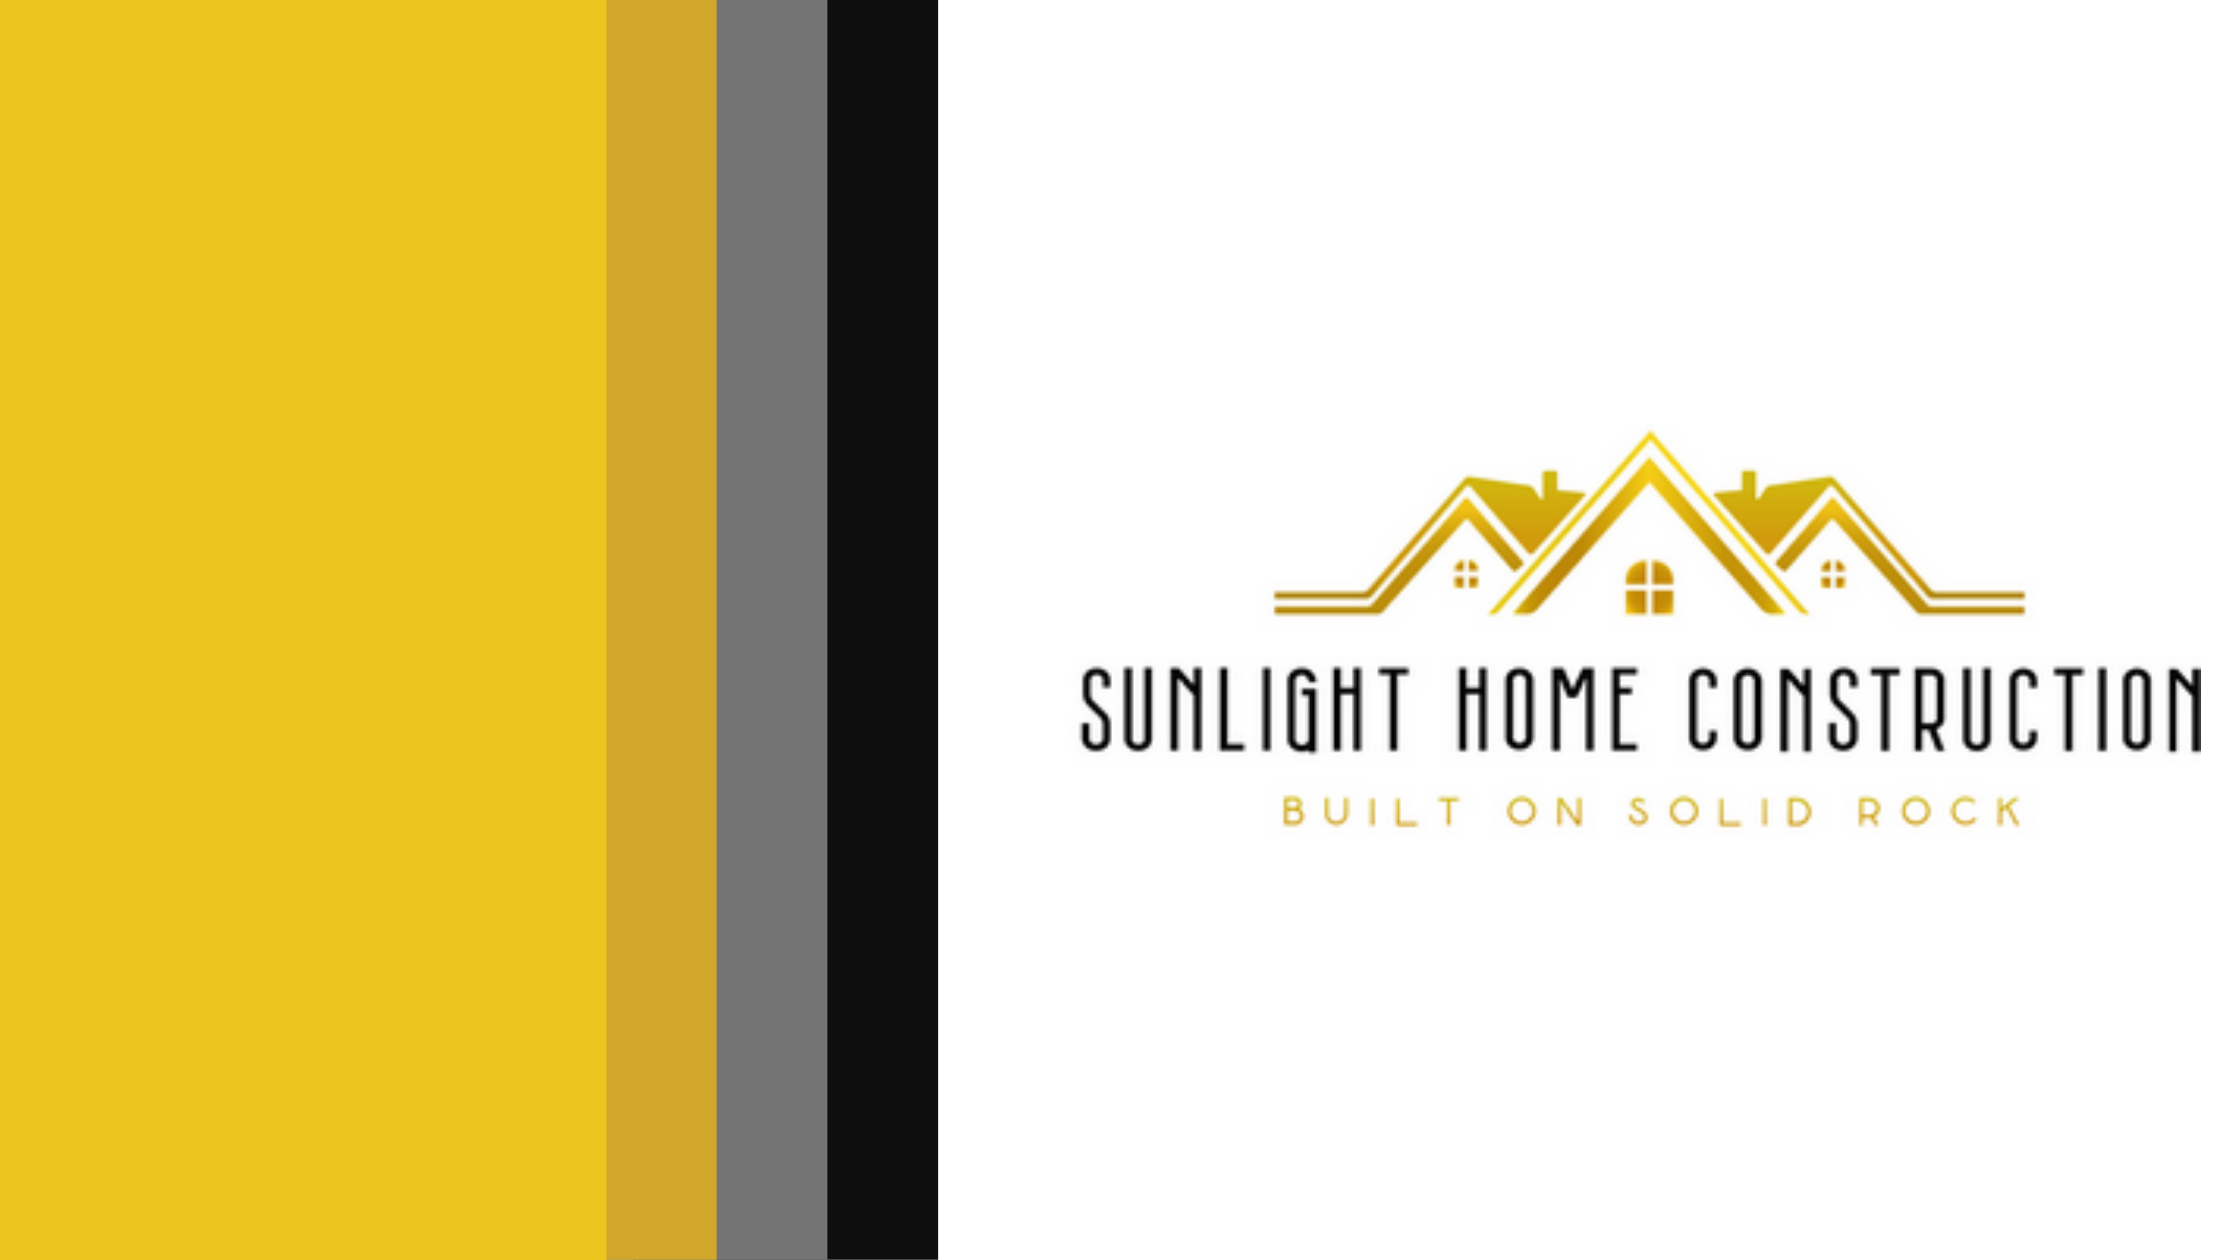 Sunlight Home